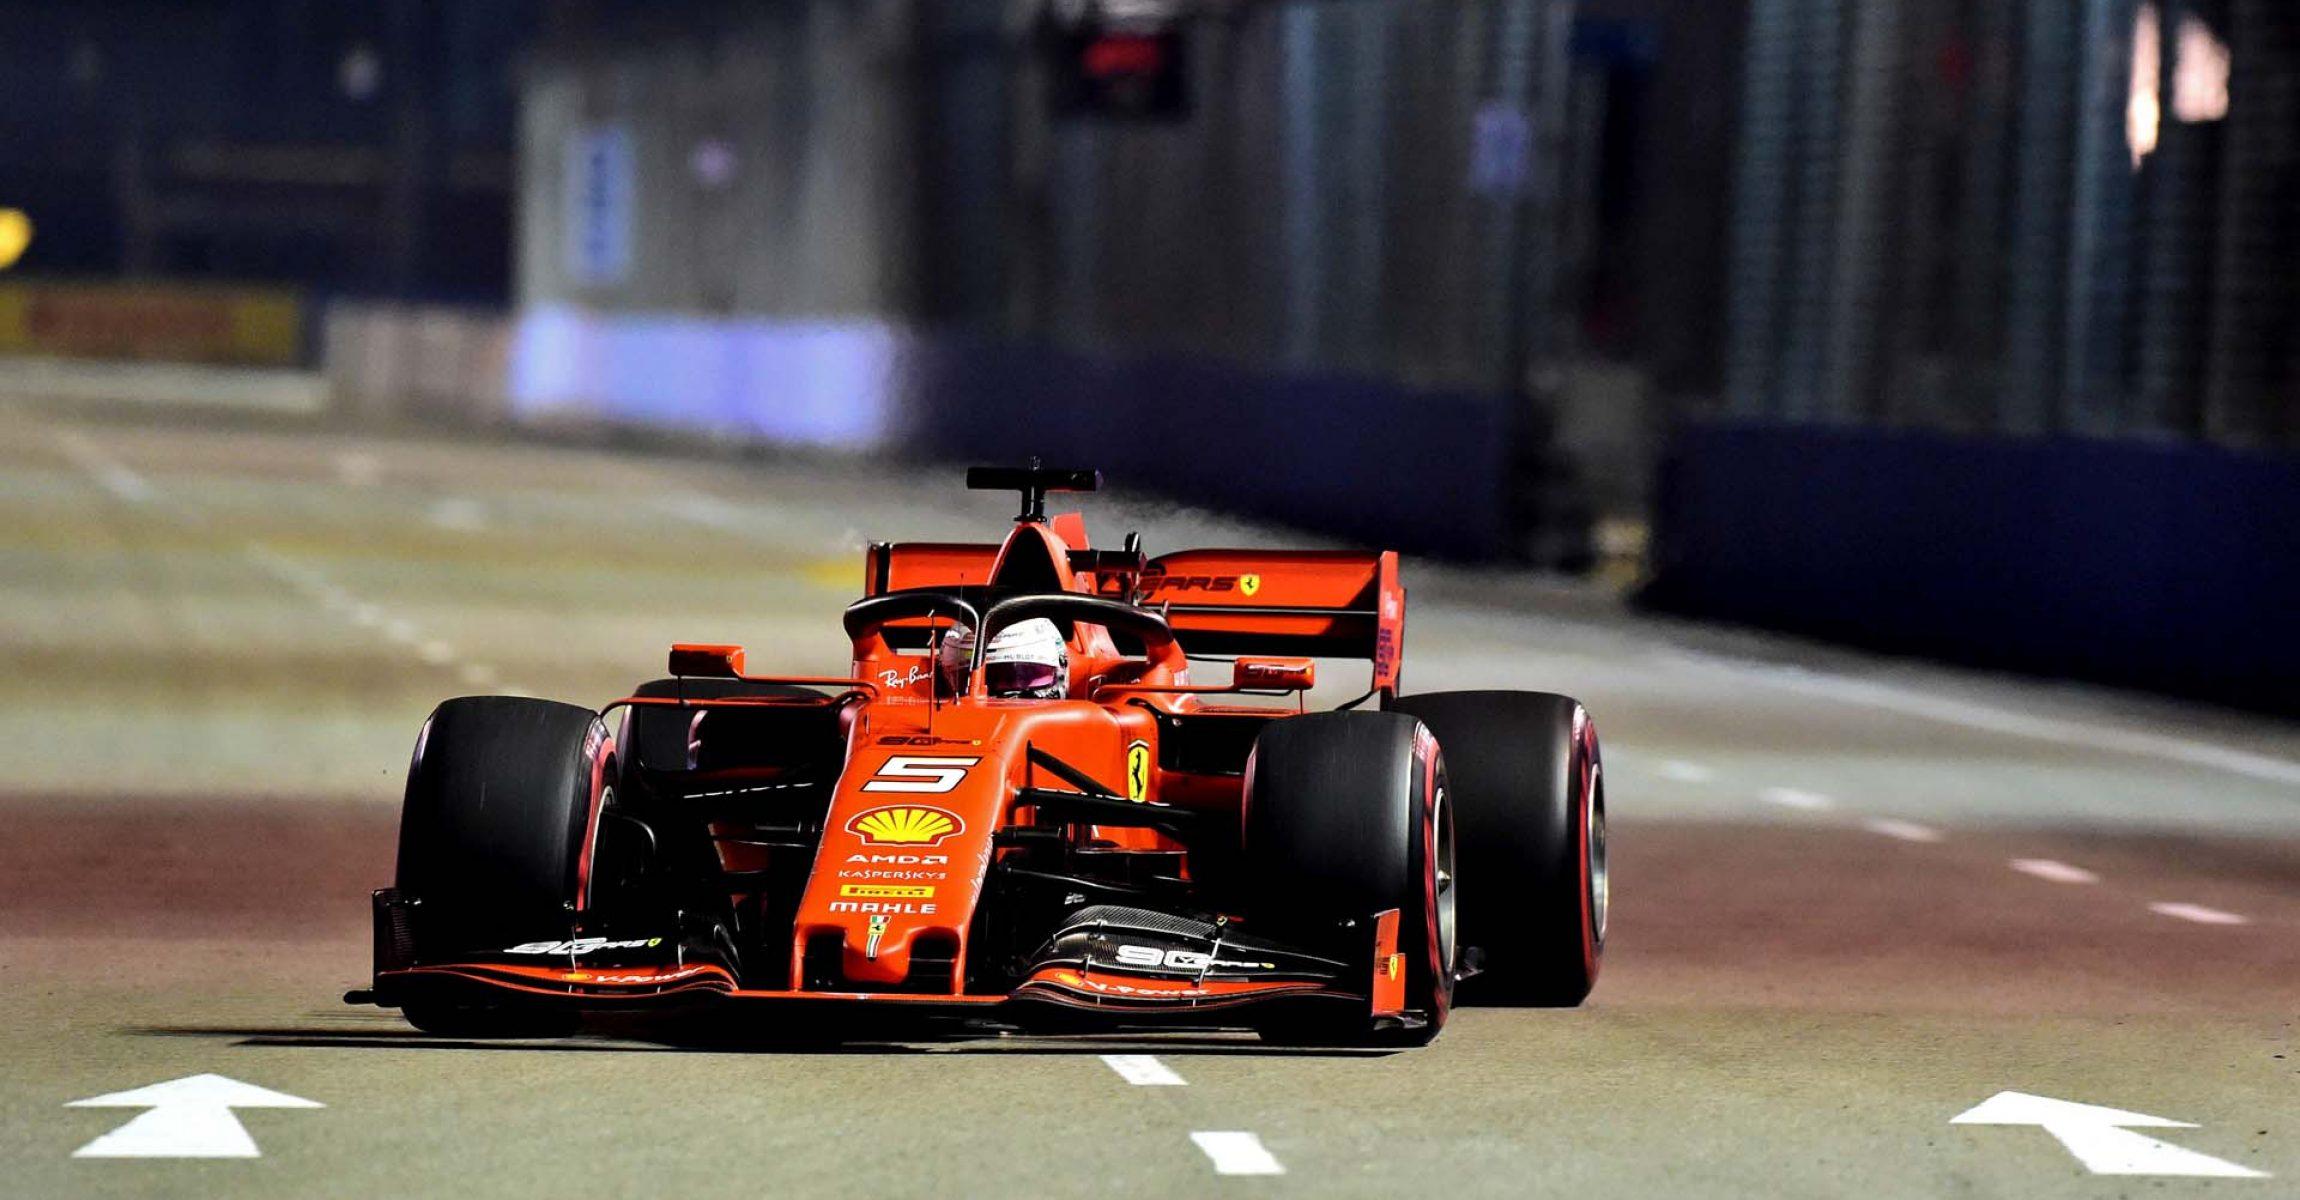 GP SINGAPORE F1/2019 -  VENERDI 20/09/2019   credit: @Scuderia Ferrari Press Office Sebastian Vettel